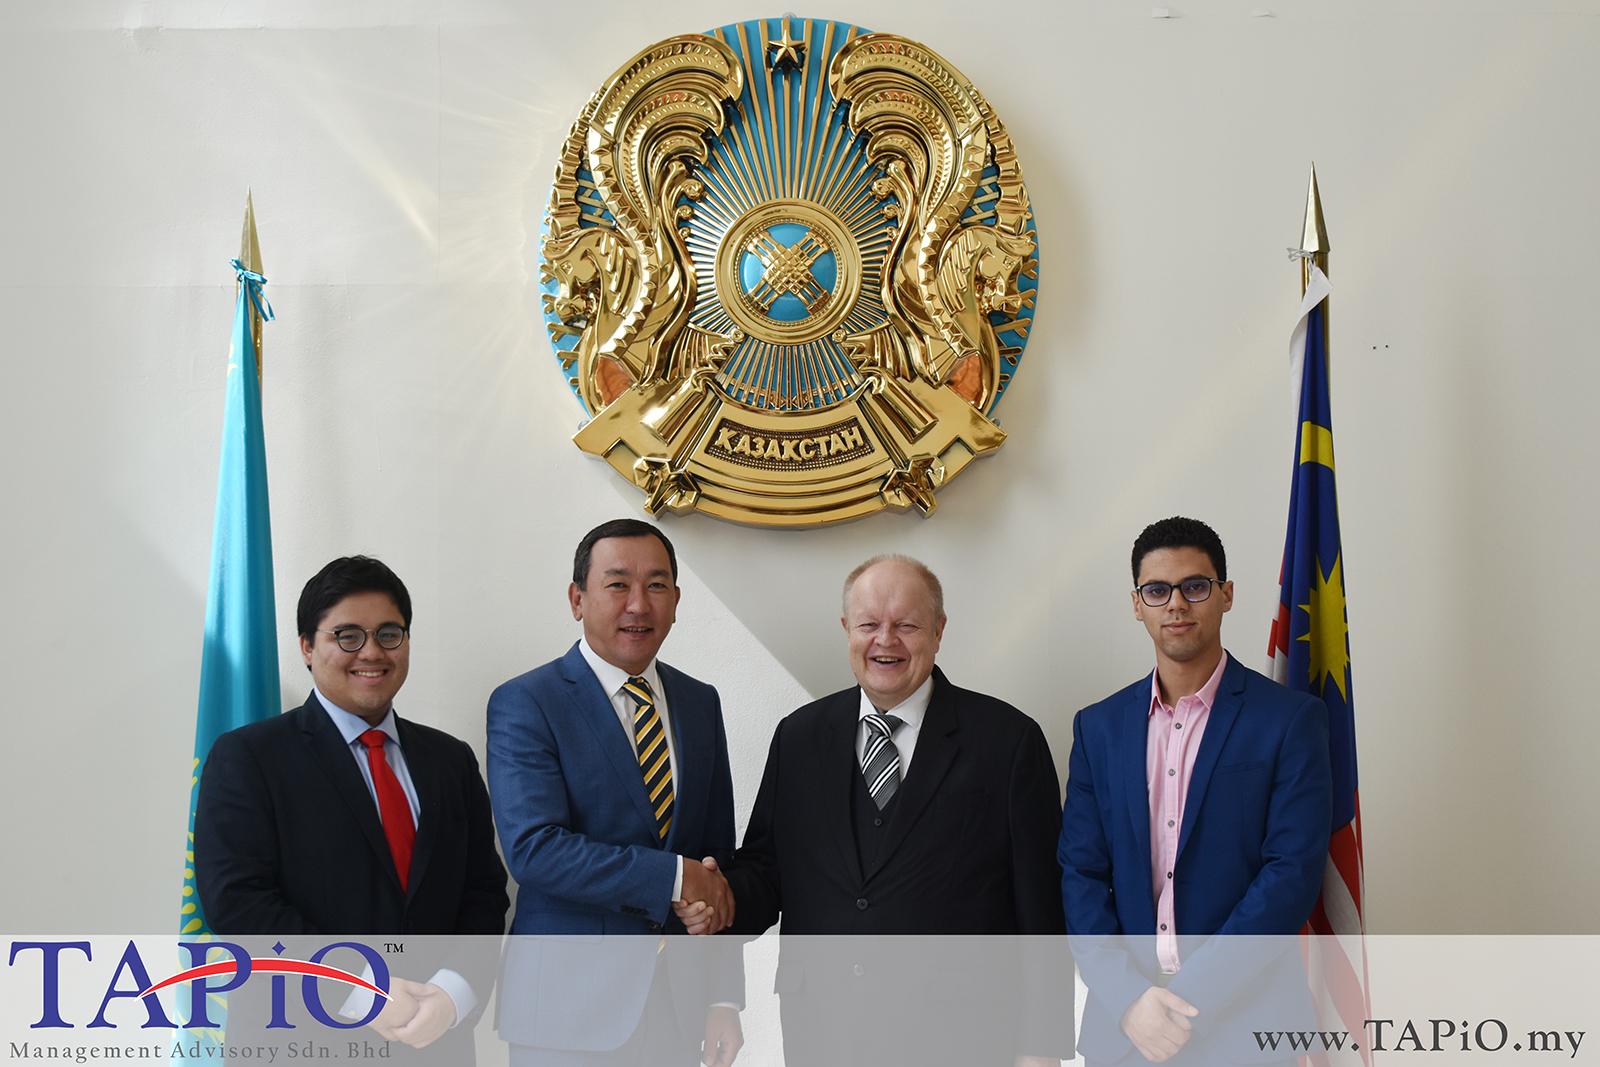 Meeting with the Ambassador of Kazakhstan - 14/03/2019